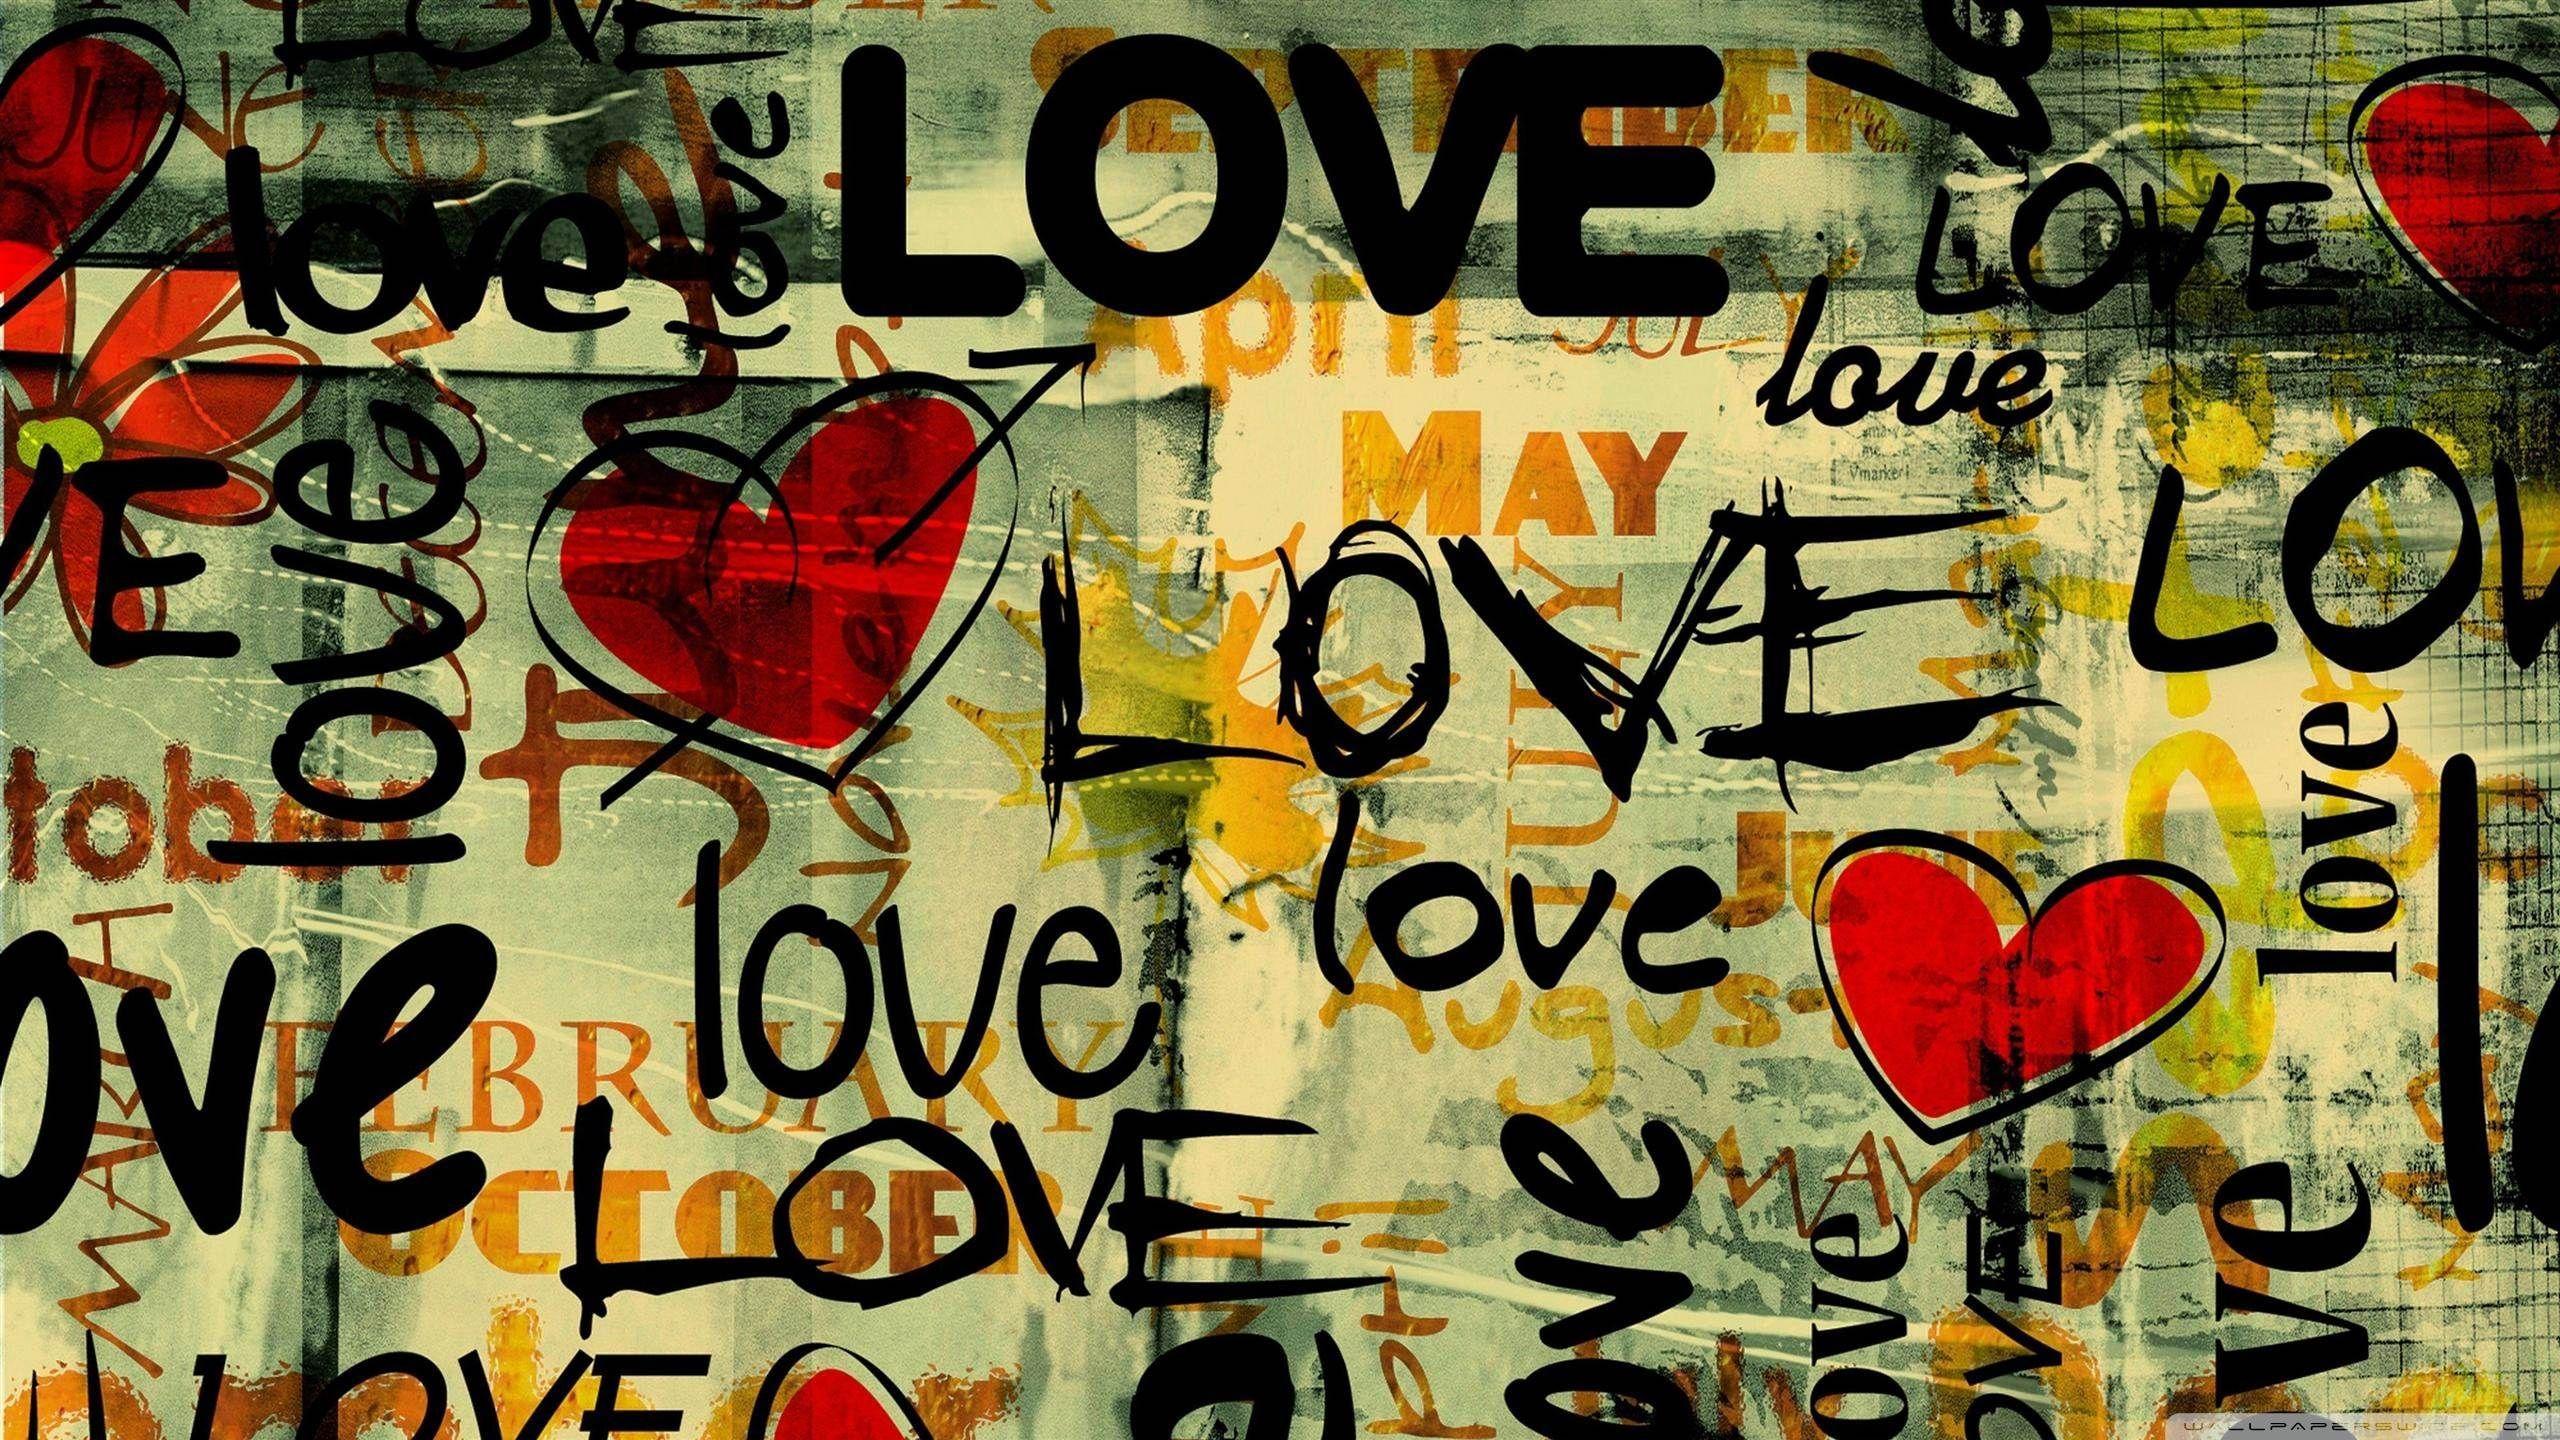 D Love Couple Cartoon Wallpapers Download D Wallpaper Hd 2560 1440 Love Pic Hd Adorable Wallpapers Love Wallpaper Love Graffiti Love Backgrounds